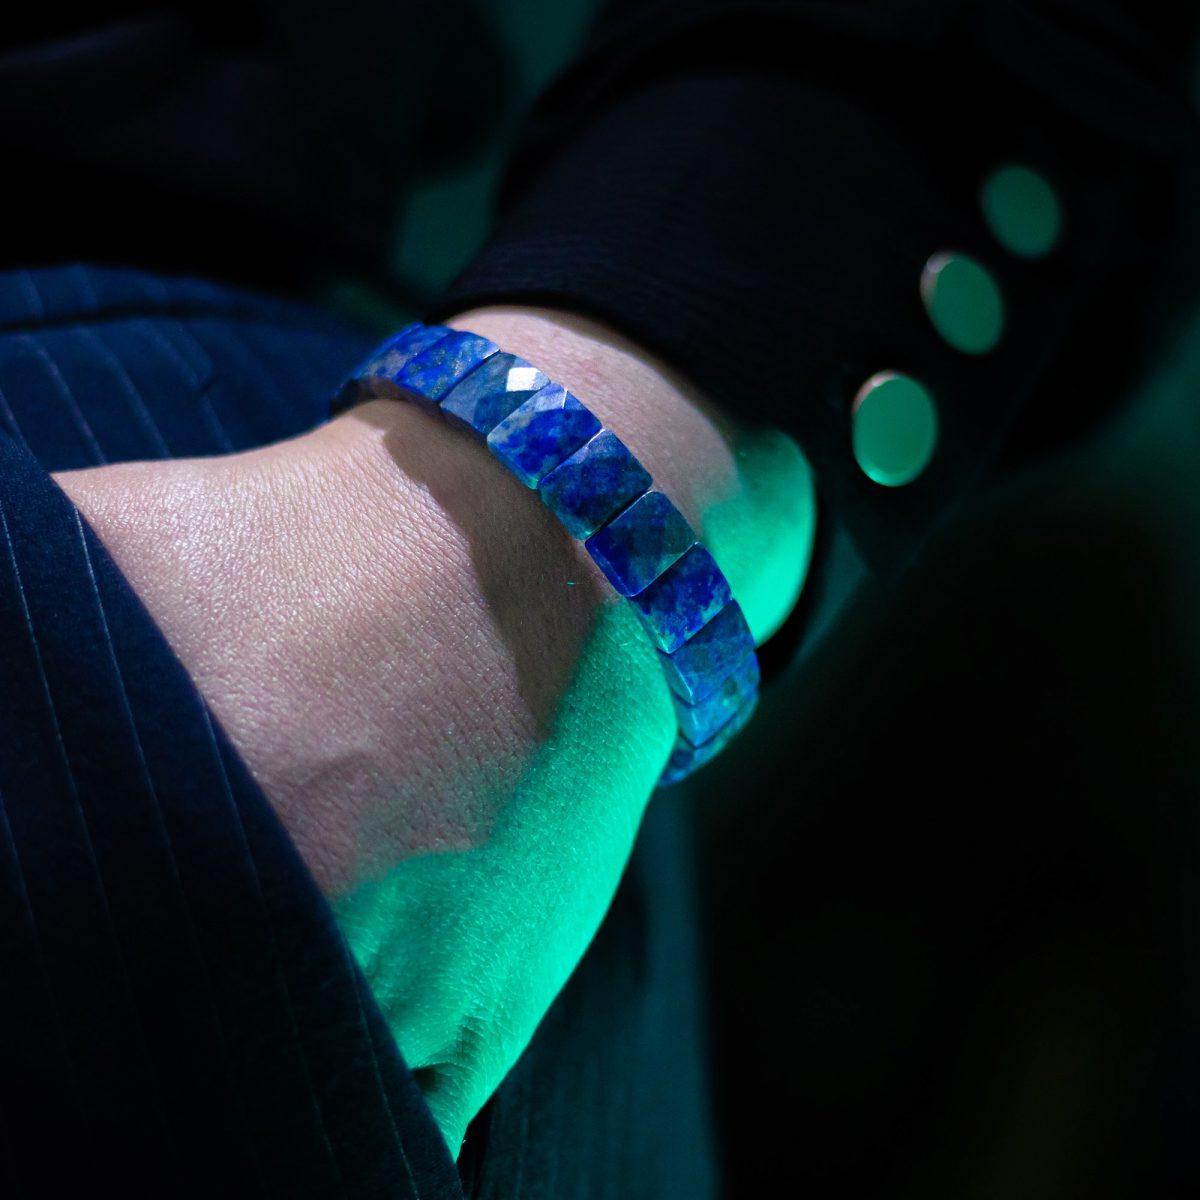 meliora-zapestnica-lapis lazuli-poldragi kamen-portal8